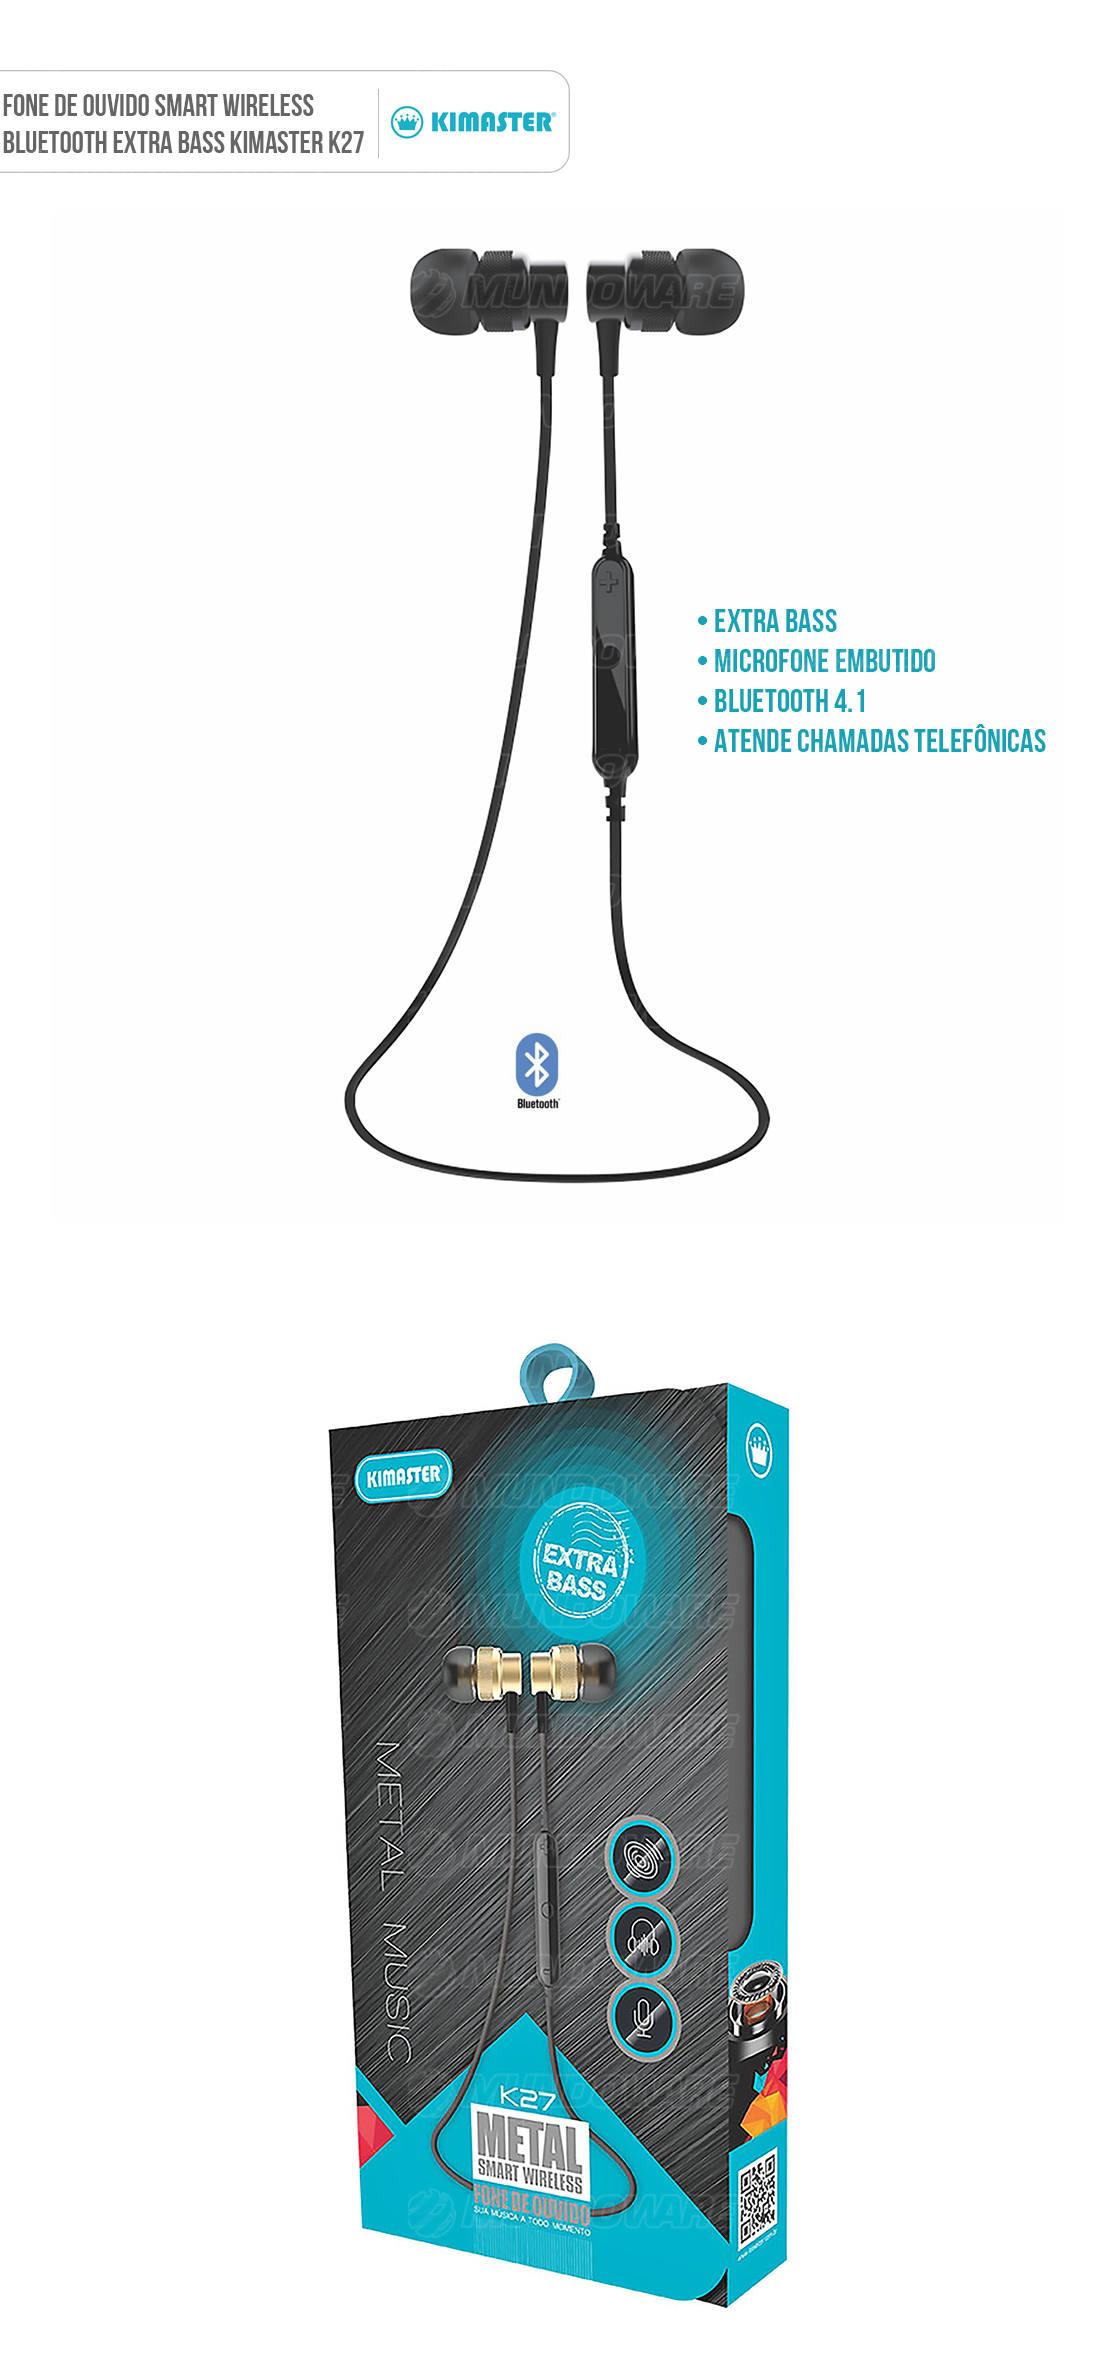 Fone Bluetooth Metal Smart Wireless Extra Bass Microfone Embutido Kimaster K27